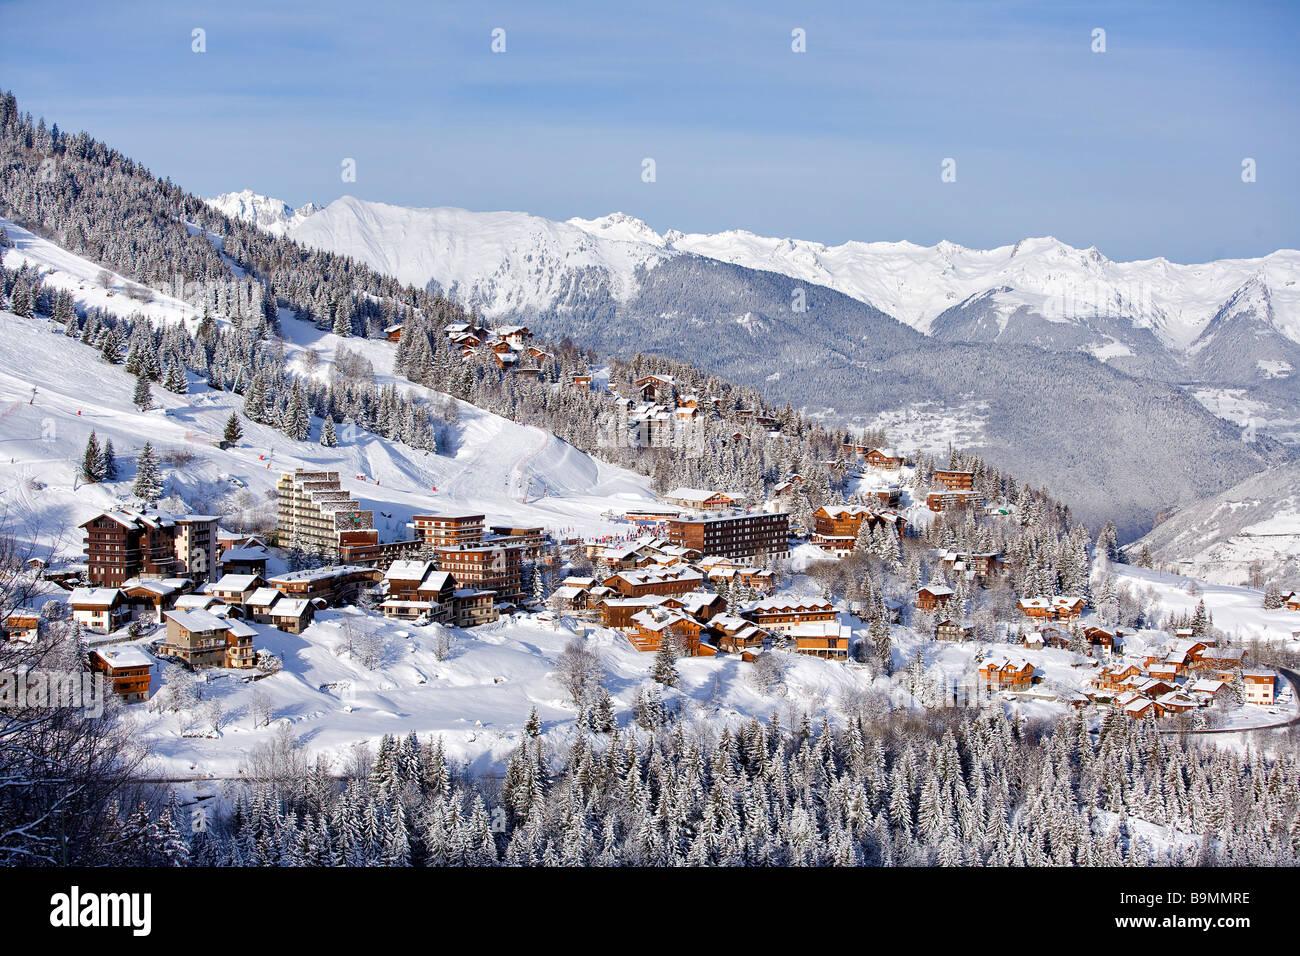 France, Savoie, Courchevel 1550 - Stock Image